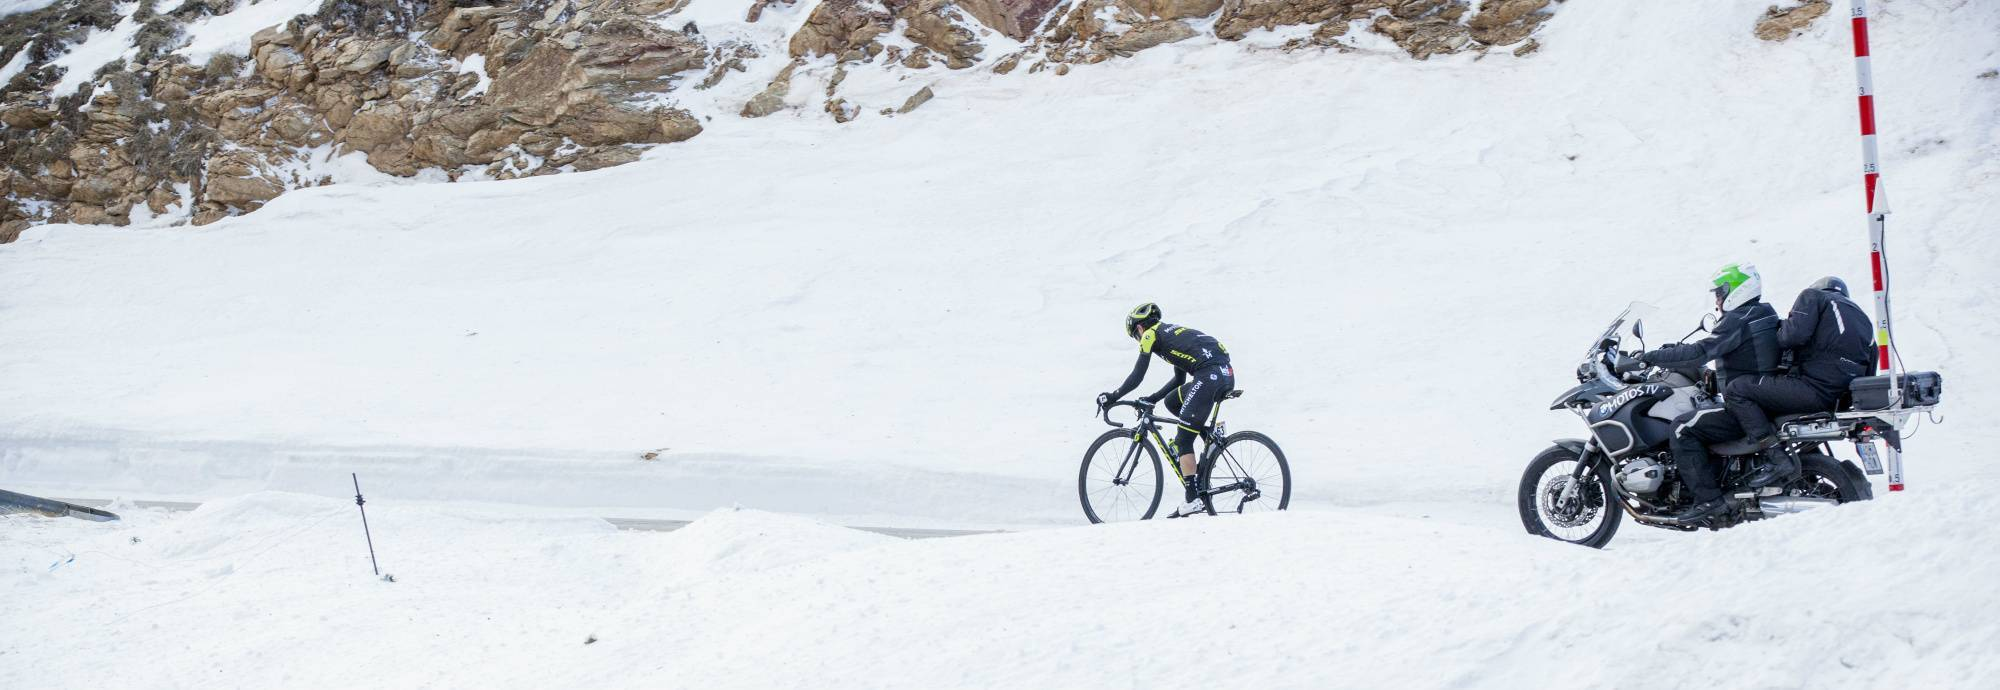 Header: LLANARS (Vall de Camprodon) > LA MOLINA (Alp)